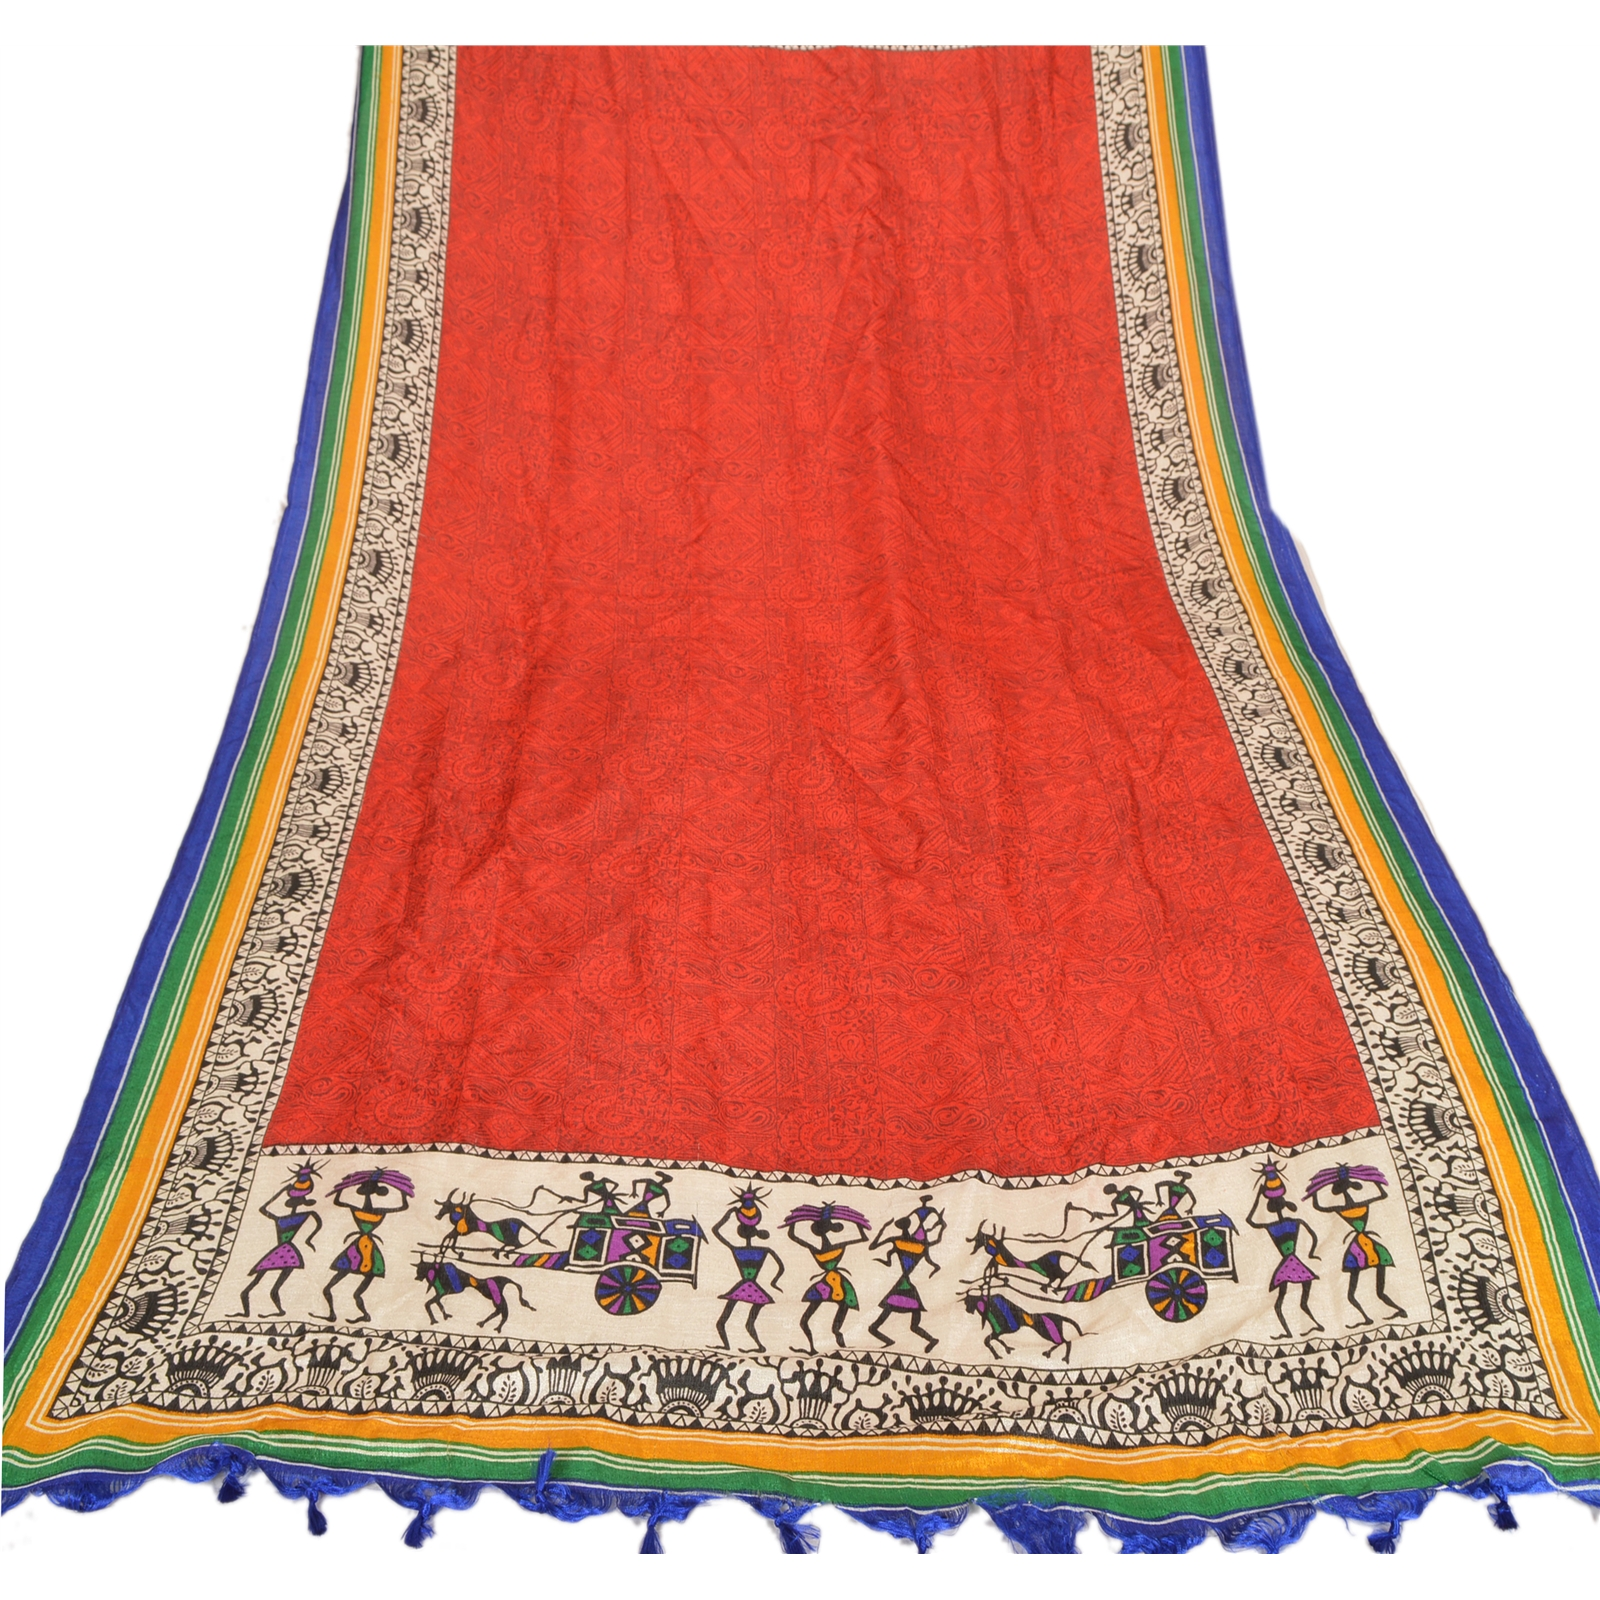 6ac40da7f7e Detalles acerca de Arte vintage dupatta larga estola TCW Seda Rojo Chal  Hijab warli Impreso- mostrar título original